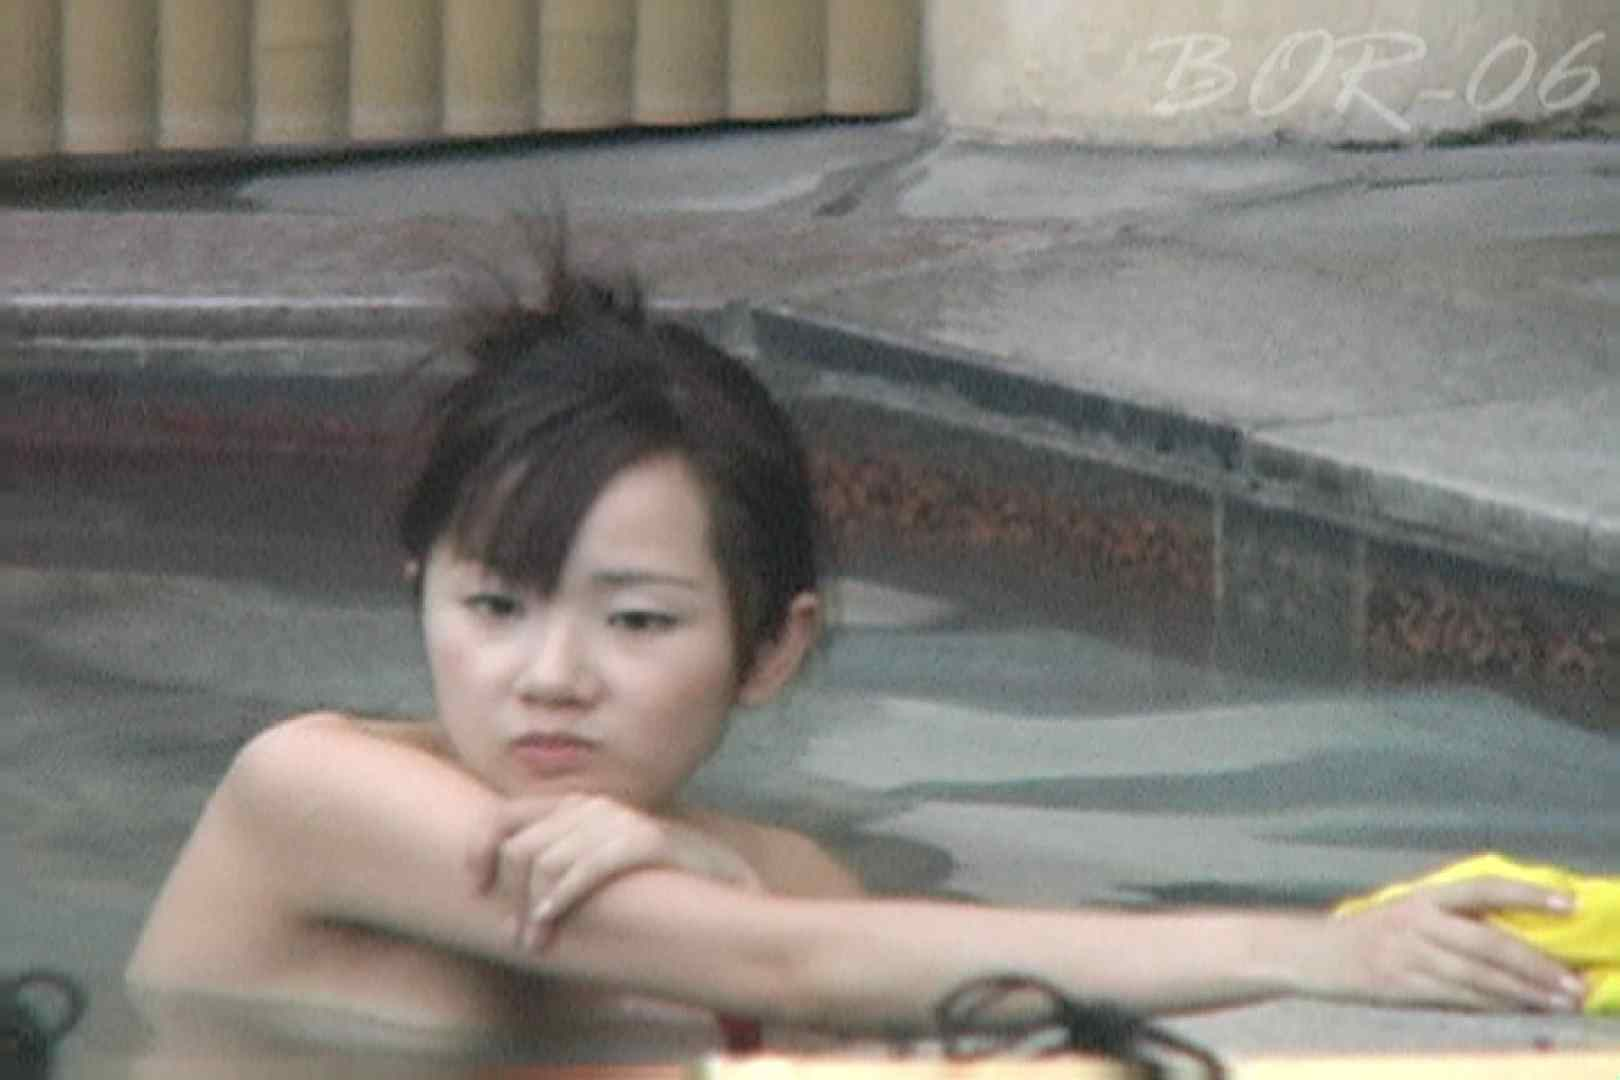 Aquaな露天風呂Vol.521 OLセックス | 盗撮  92画像 16